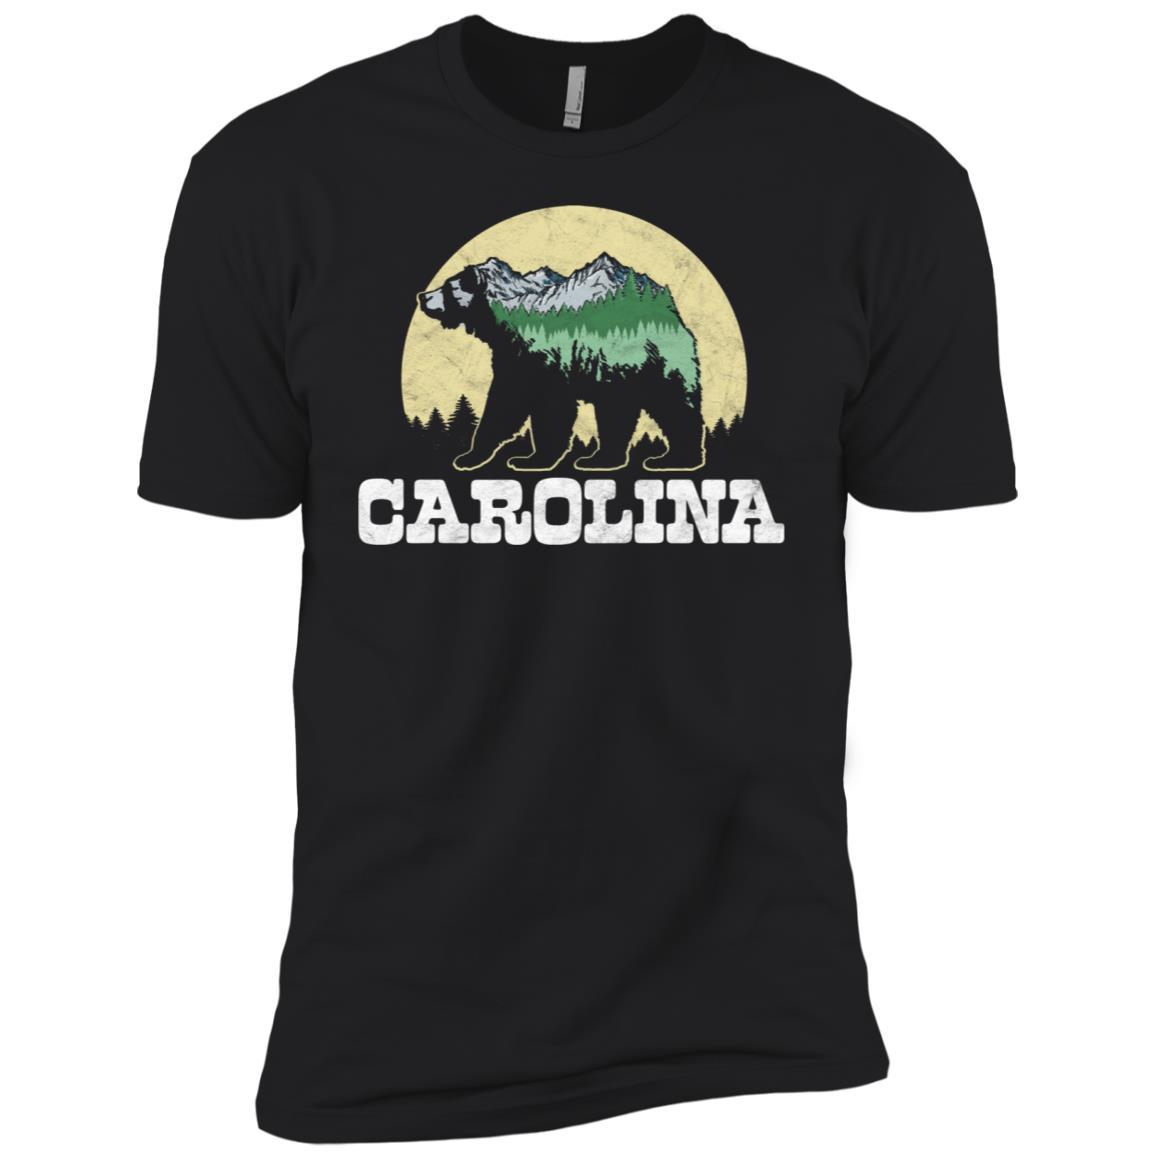 North Carolina Bear Sketch Mountains & Trees Tee Men Short Sleeve T-Shirt